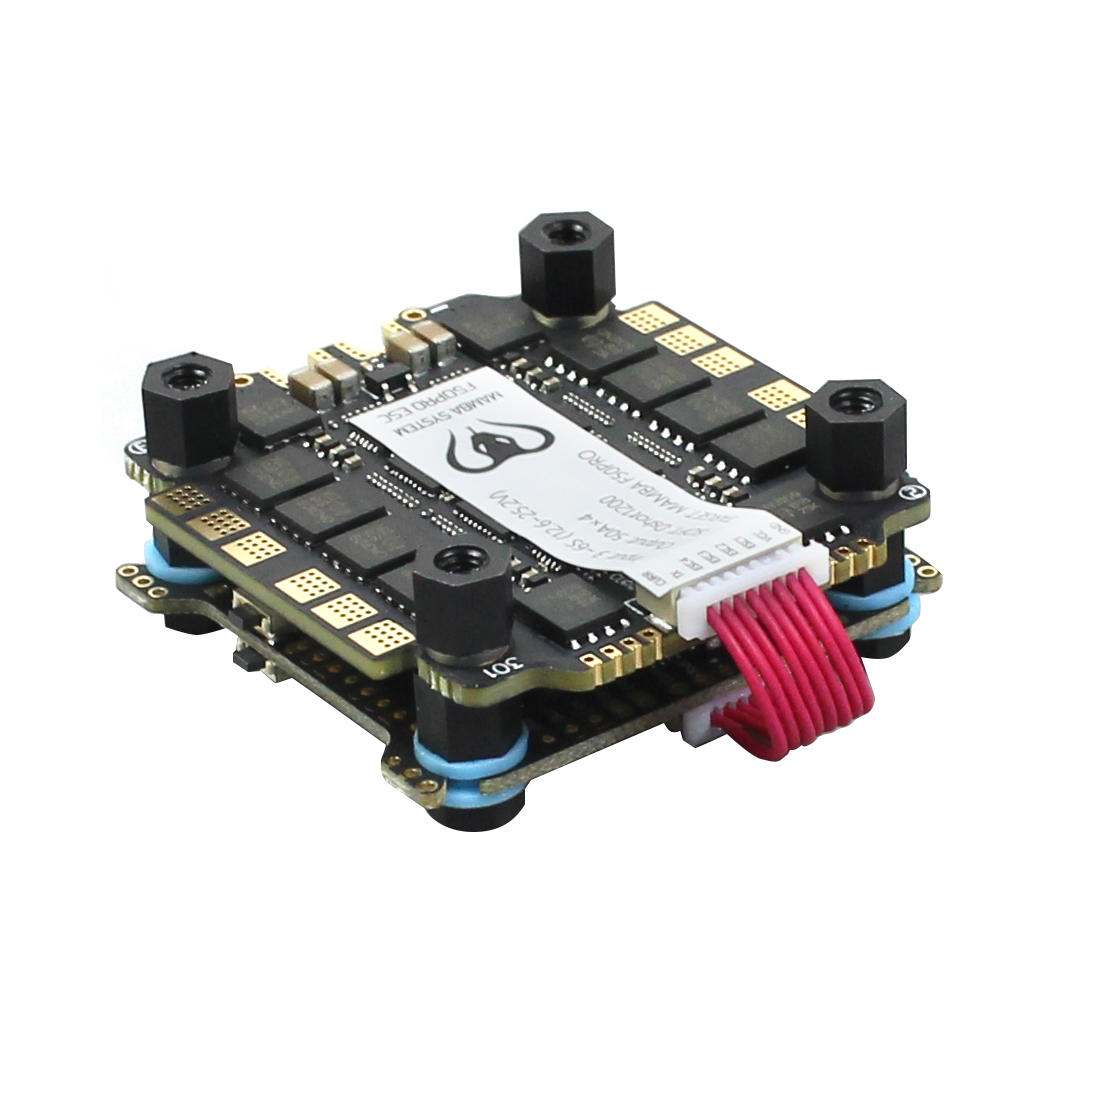 Diatone MAMBA F722S Betaflight Flight Controller OSD 5/9V 2A BEC & 50A 3-6S Blheli_32 Dshot1200 Brushless ESC for RC Drone